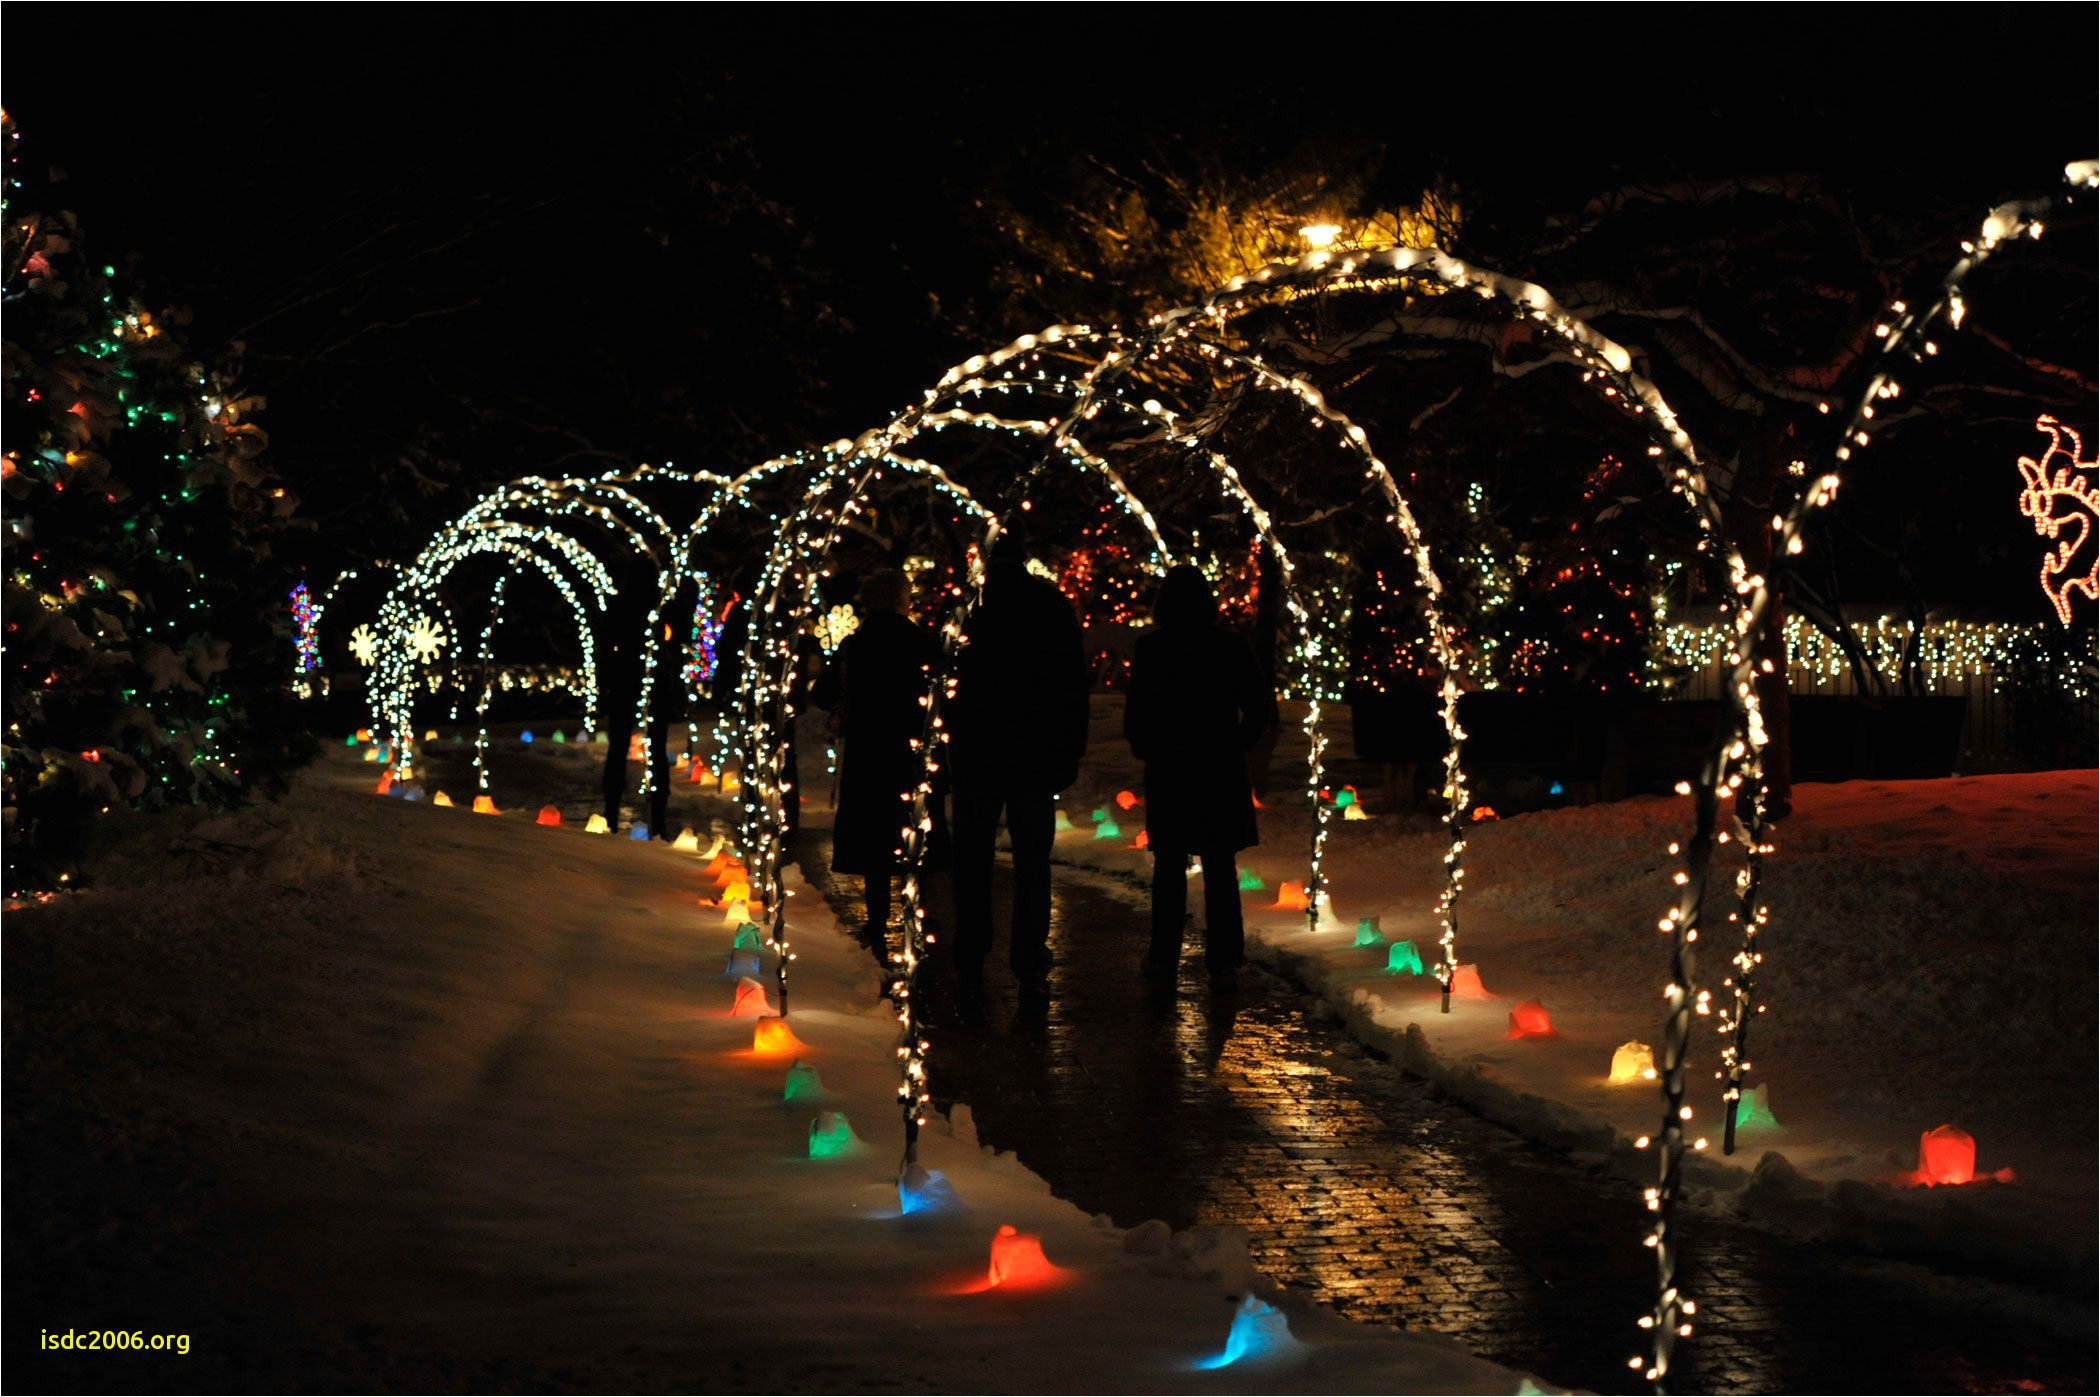 rotary gardens holiday light show